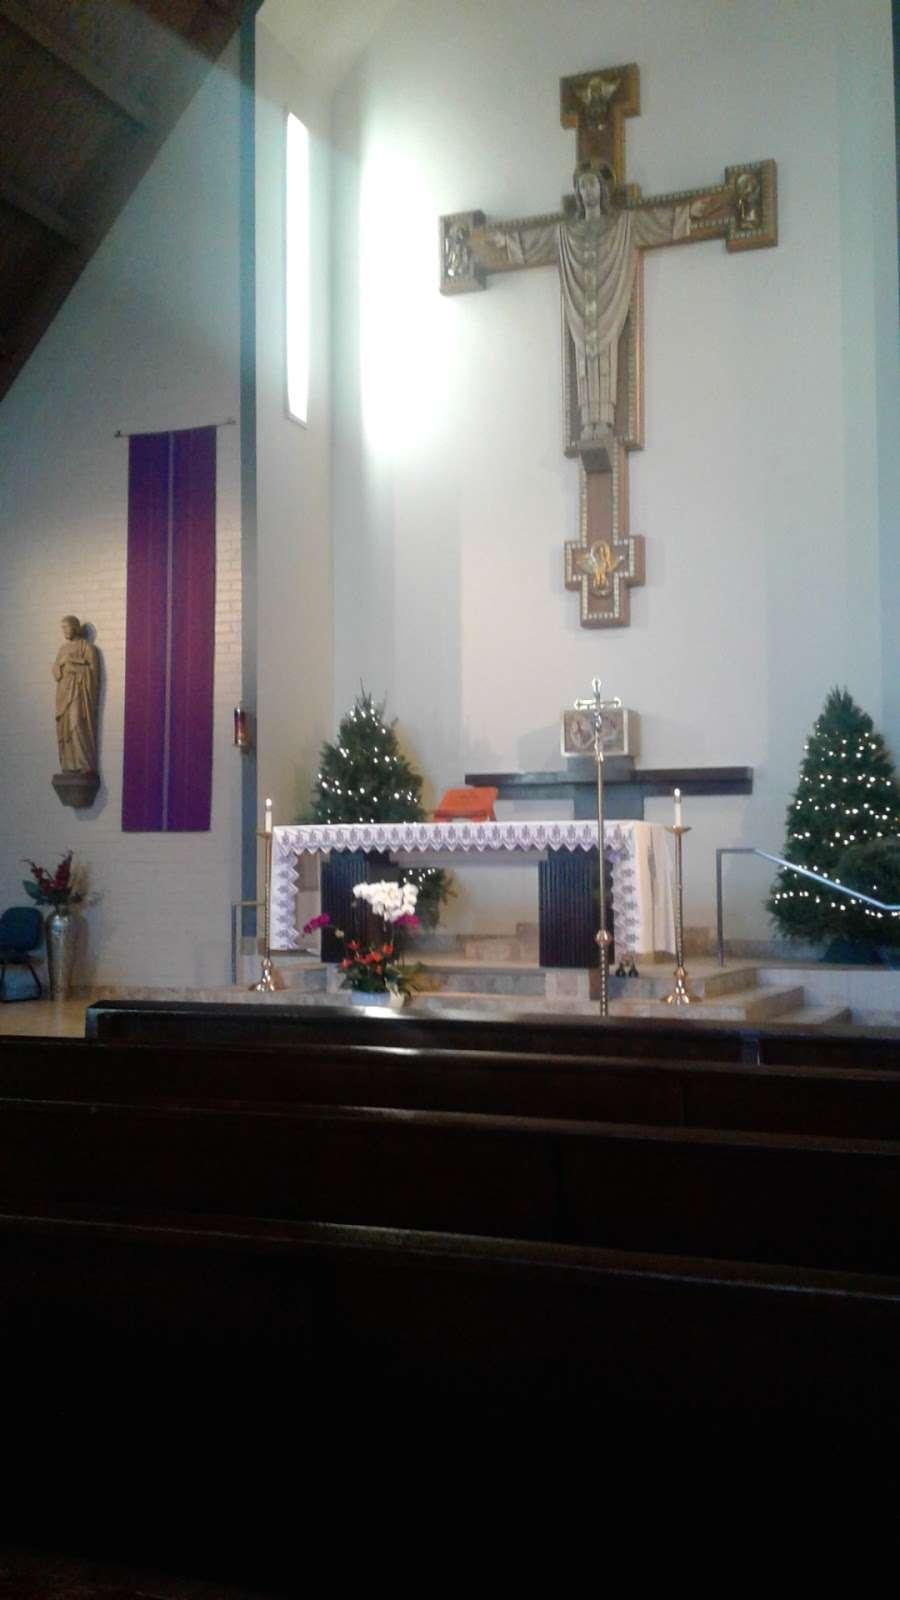 Saint Albert the Great Catholic Church - church  | Photo 10 of 10 | Address: 804 E Compton Blvd, Rancho Dominguez, CA 90220, USA | Phone: (310) 329-7548